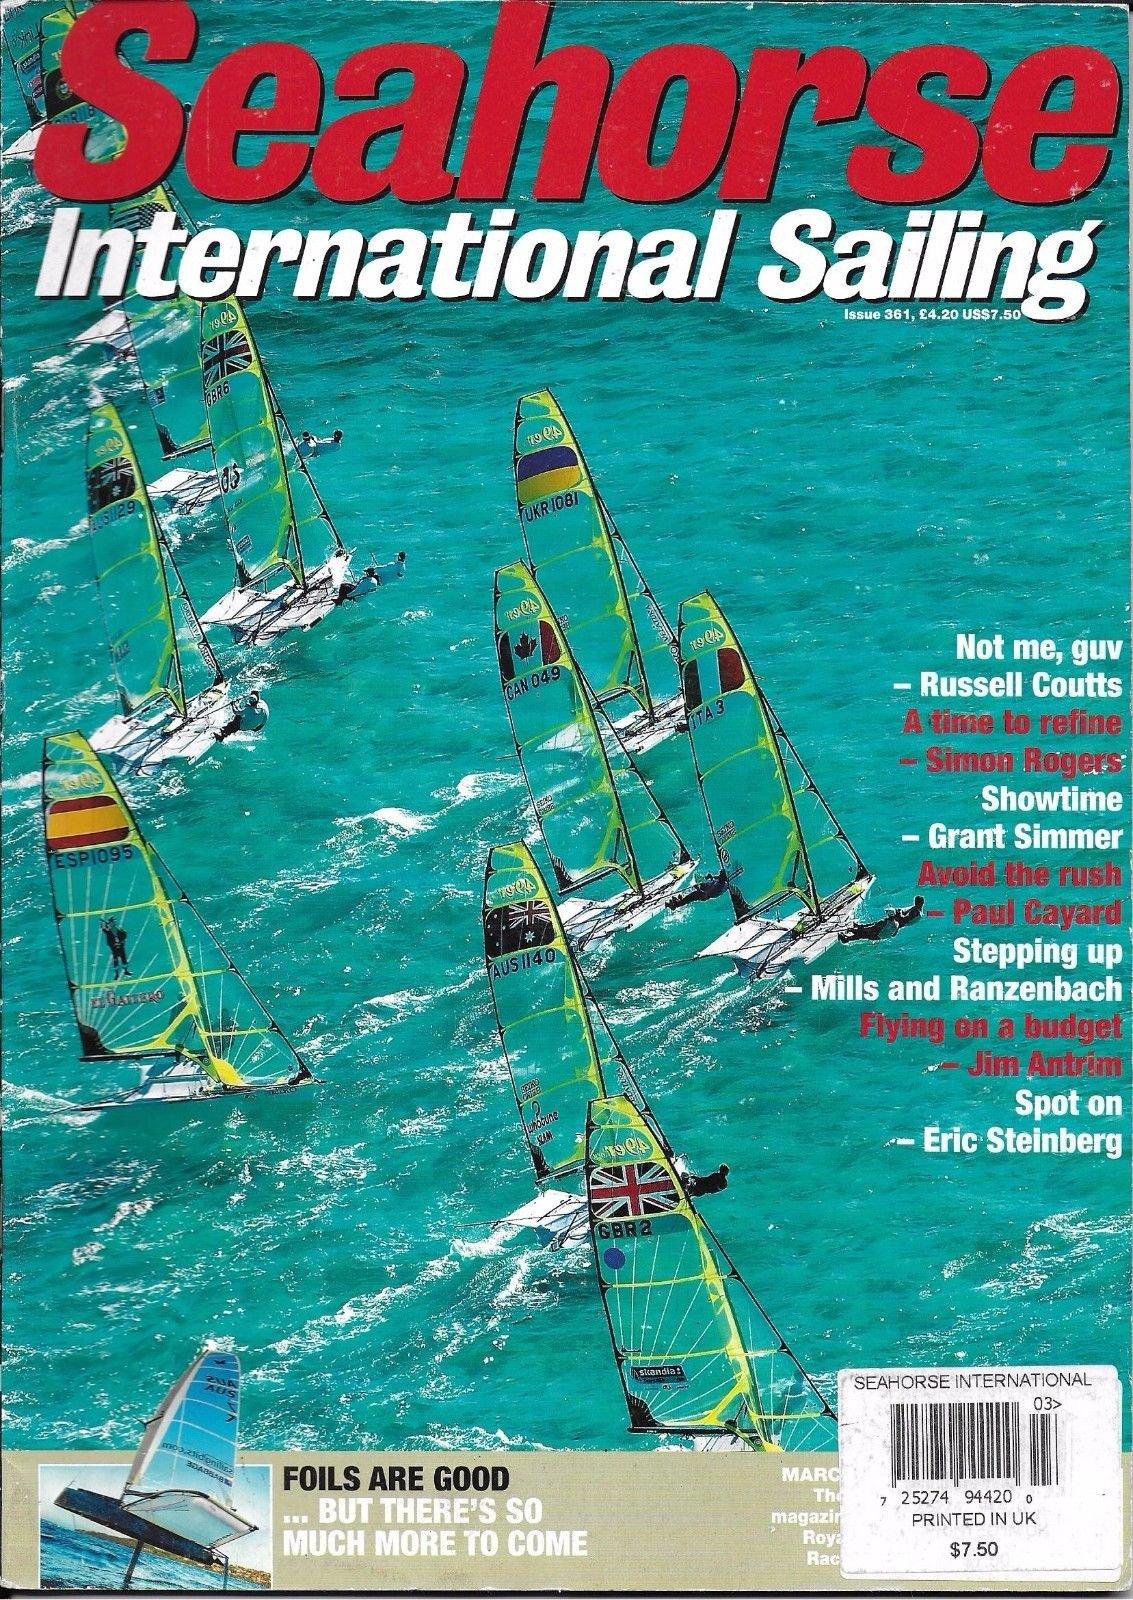 Seahorse International Sailing magazine March 2010 ebook